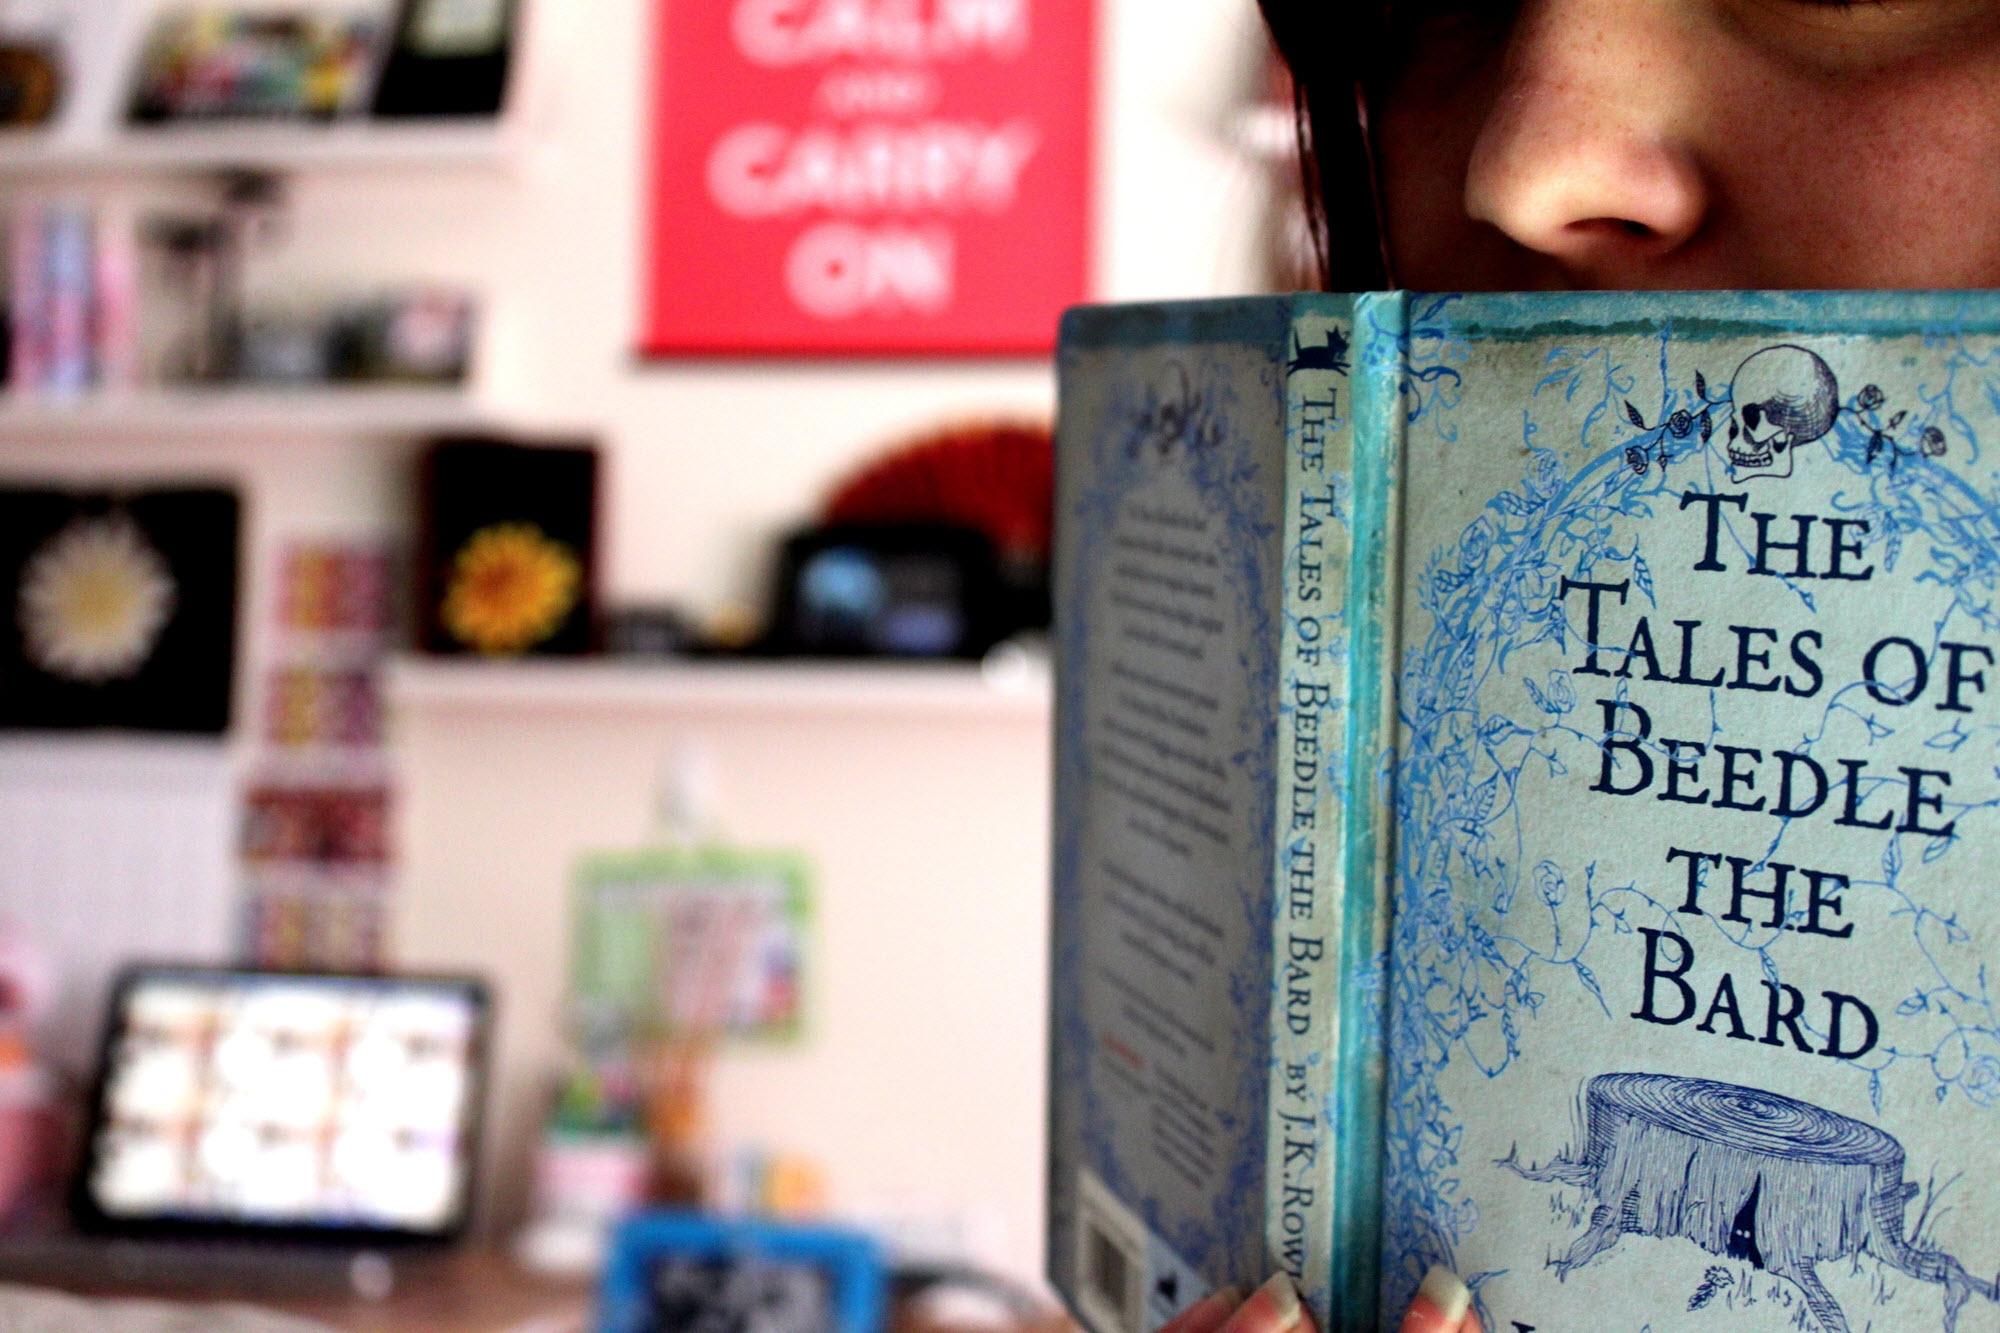 Girl reading J.K. Rowling novel / Photo by Lozikiki on Flickr